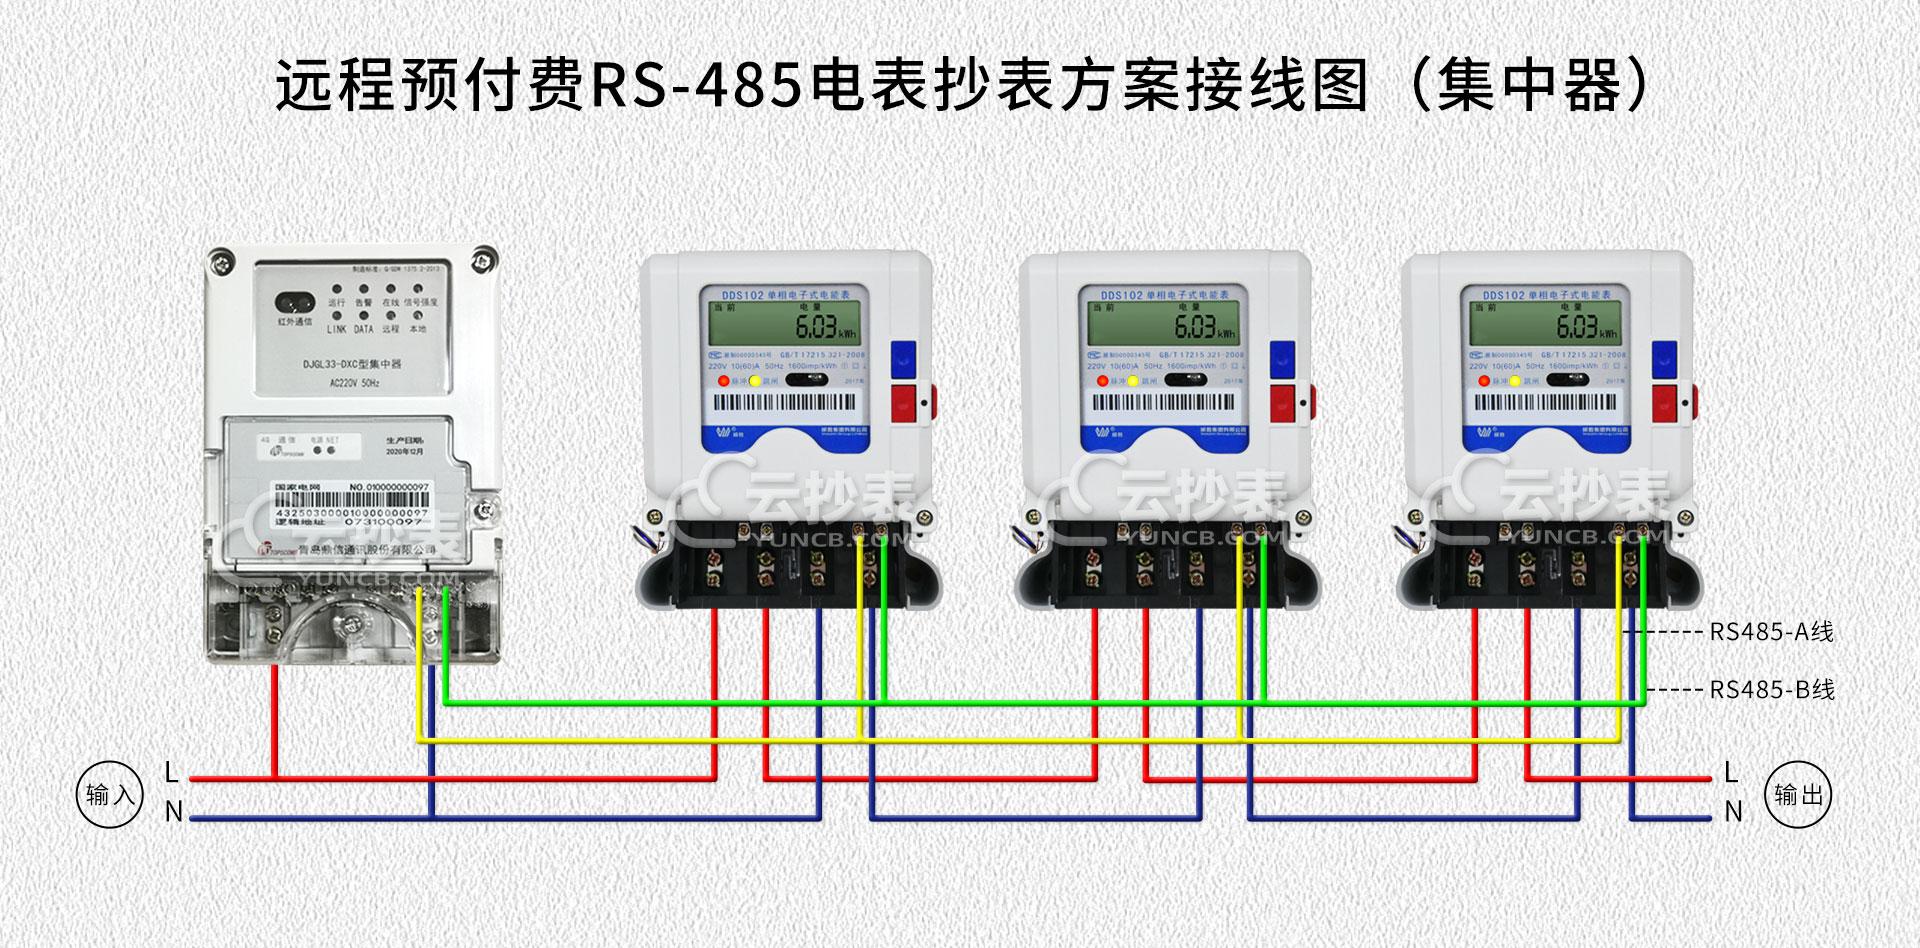 RS485抄表方案